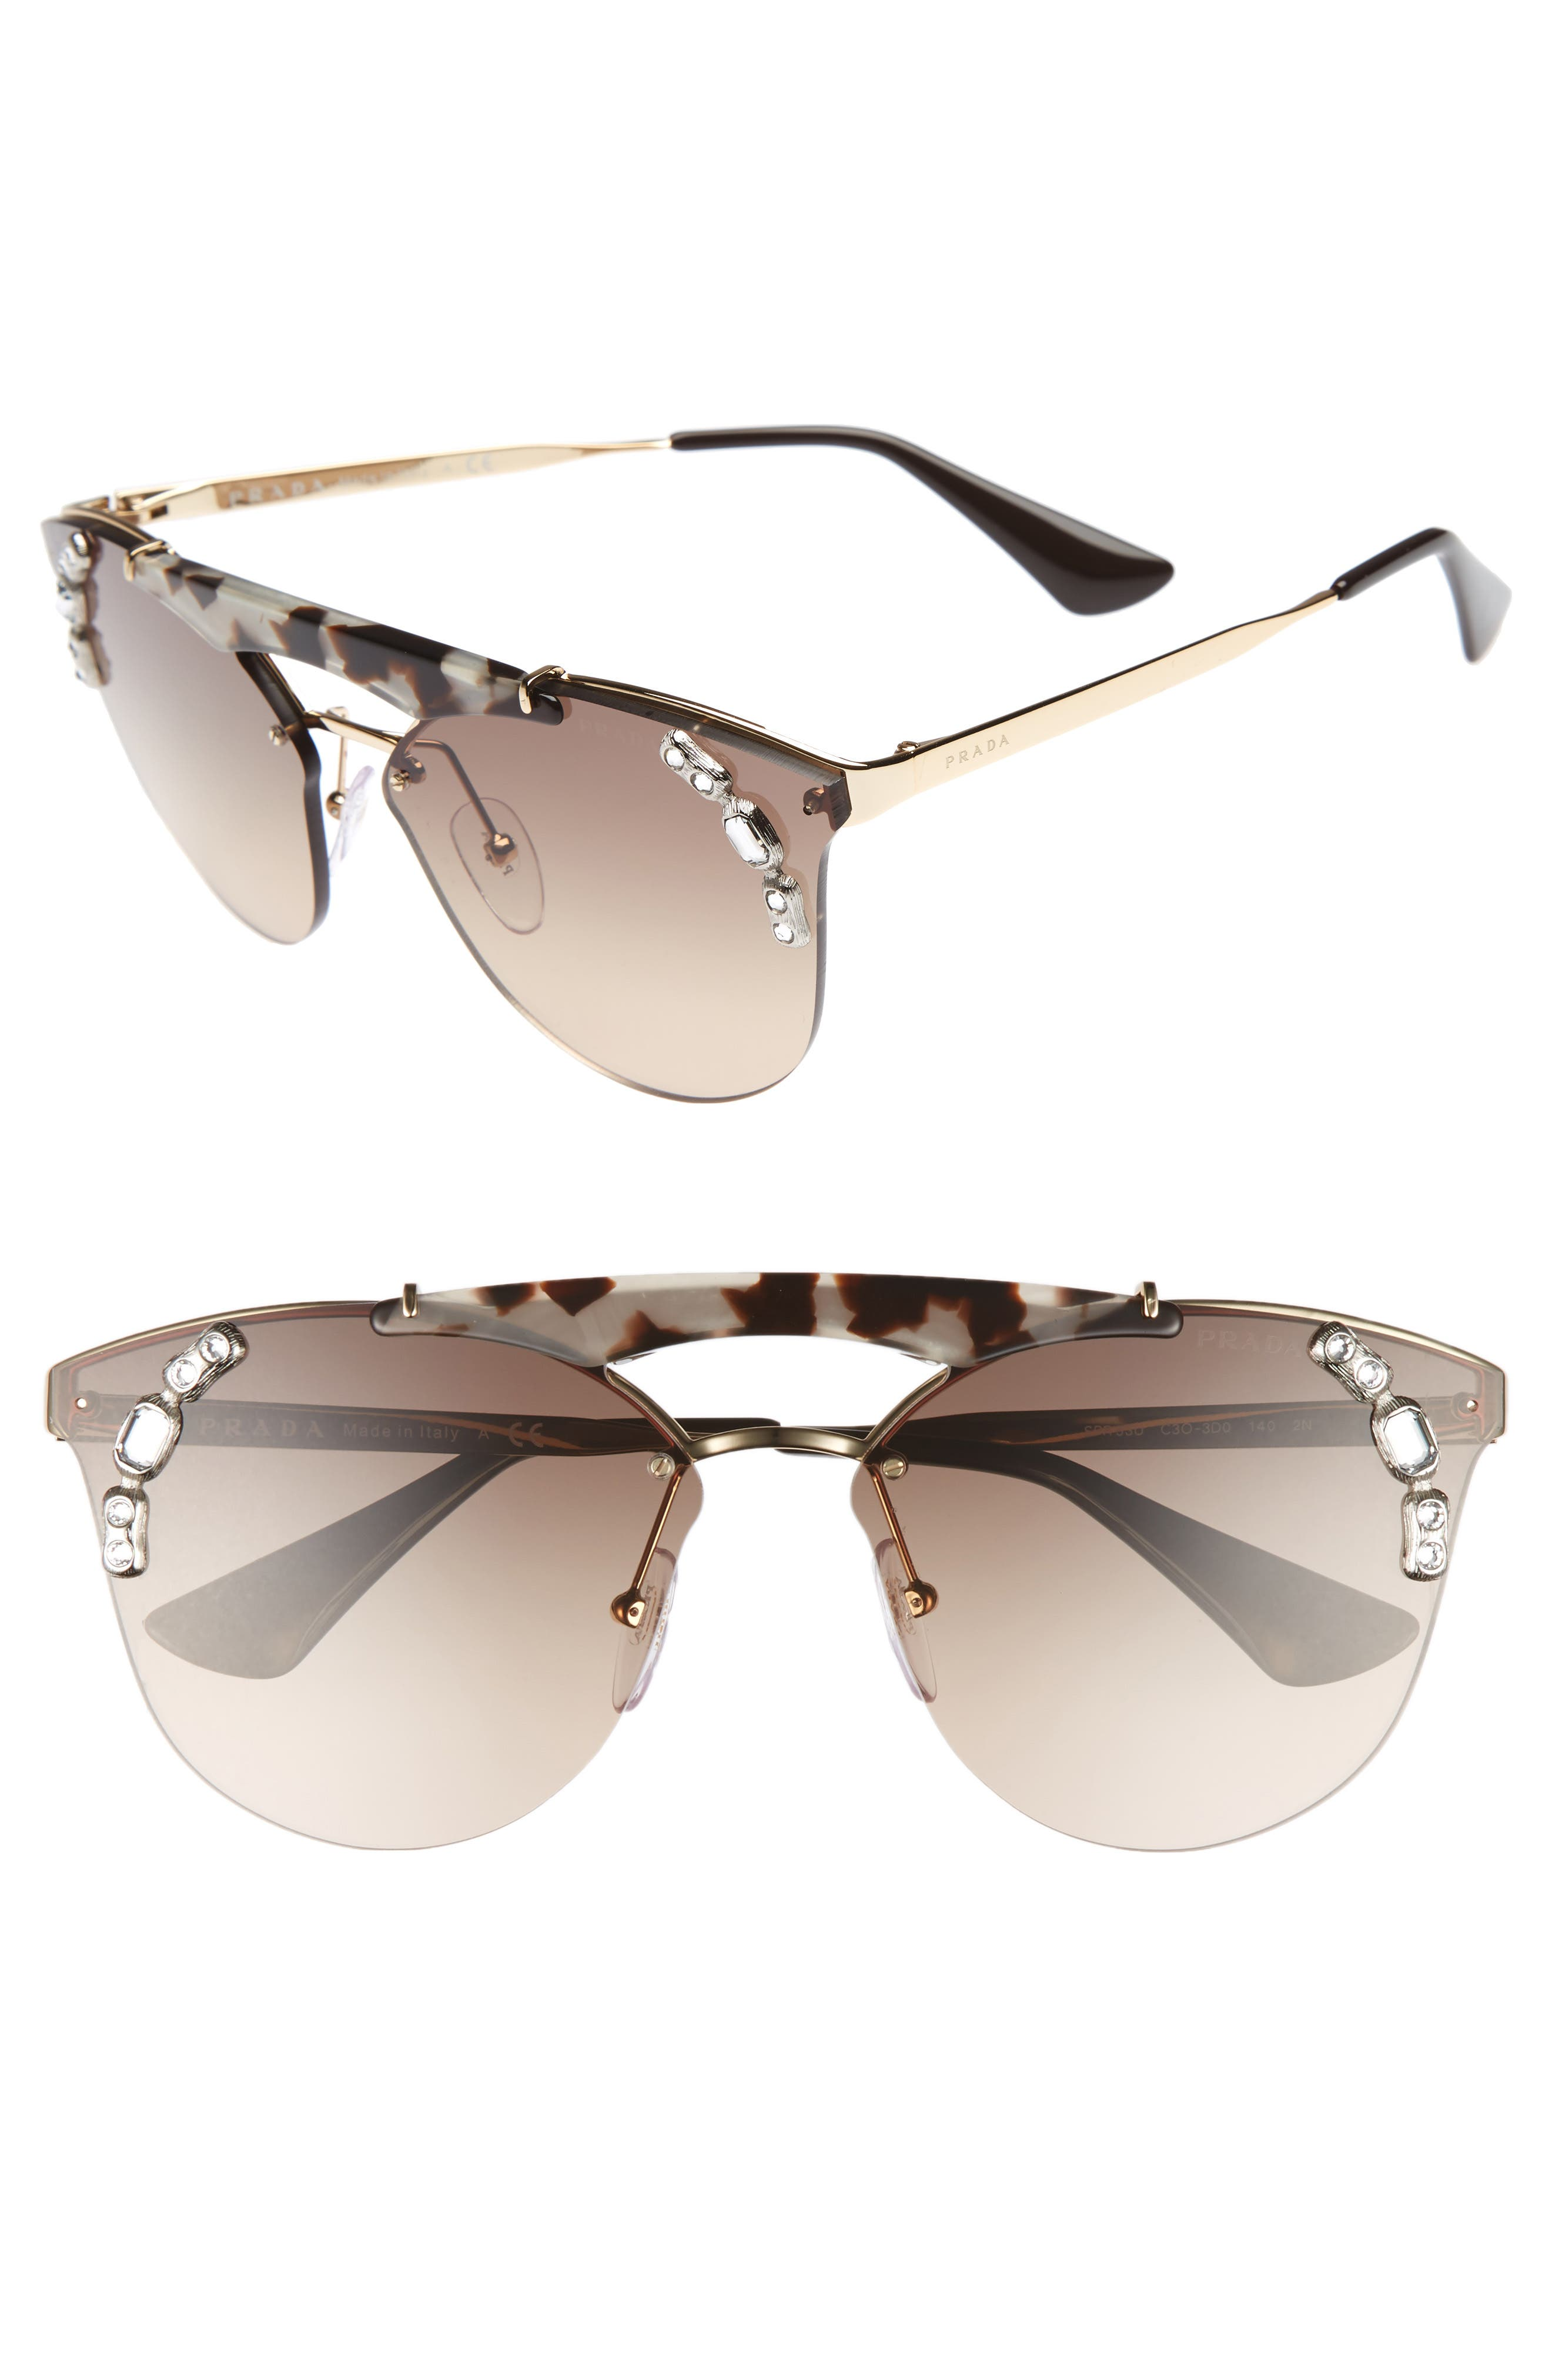 Prada 53mm Embellished Rimless Sunglasses